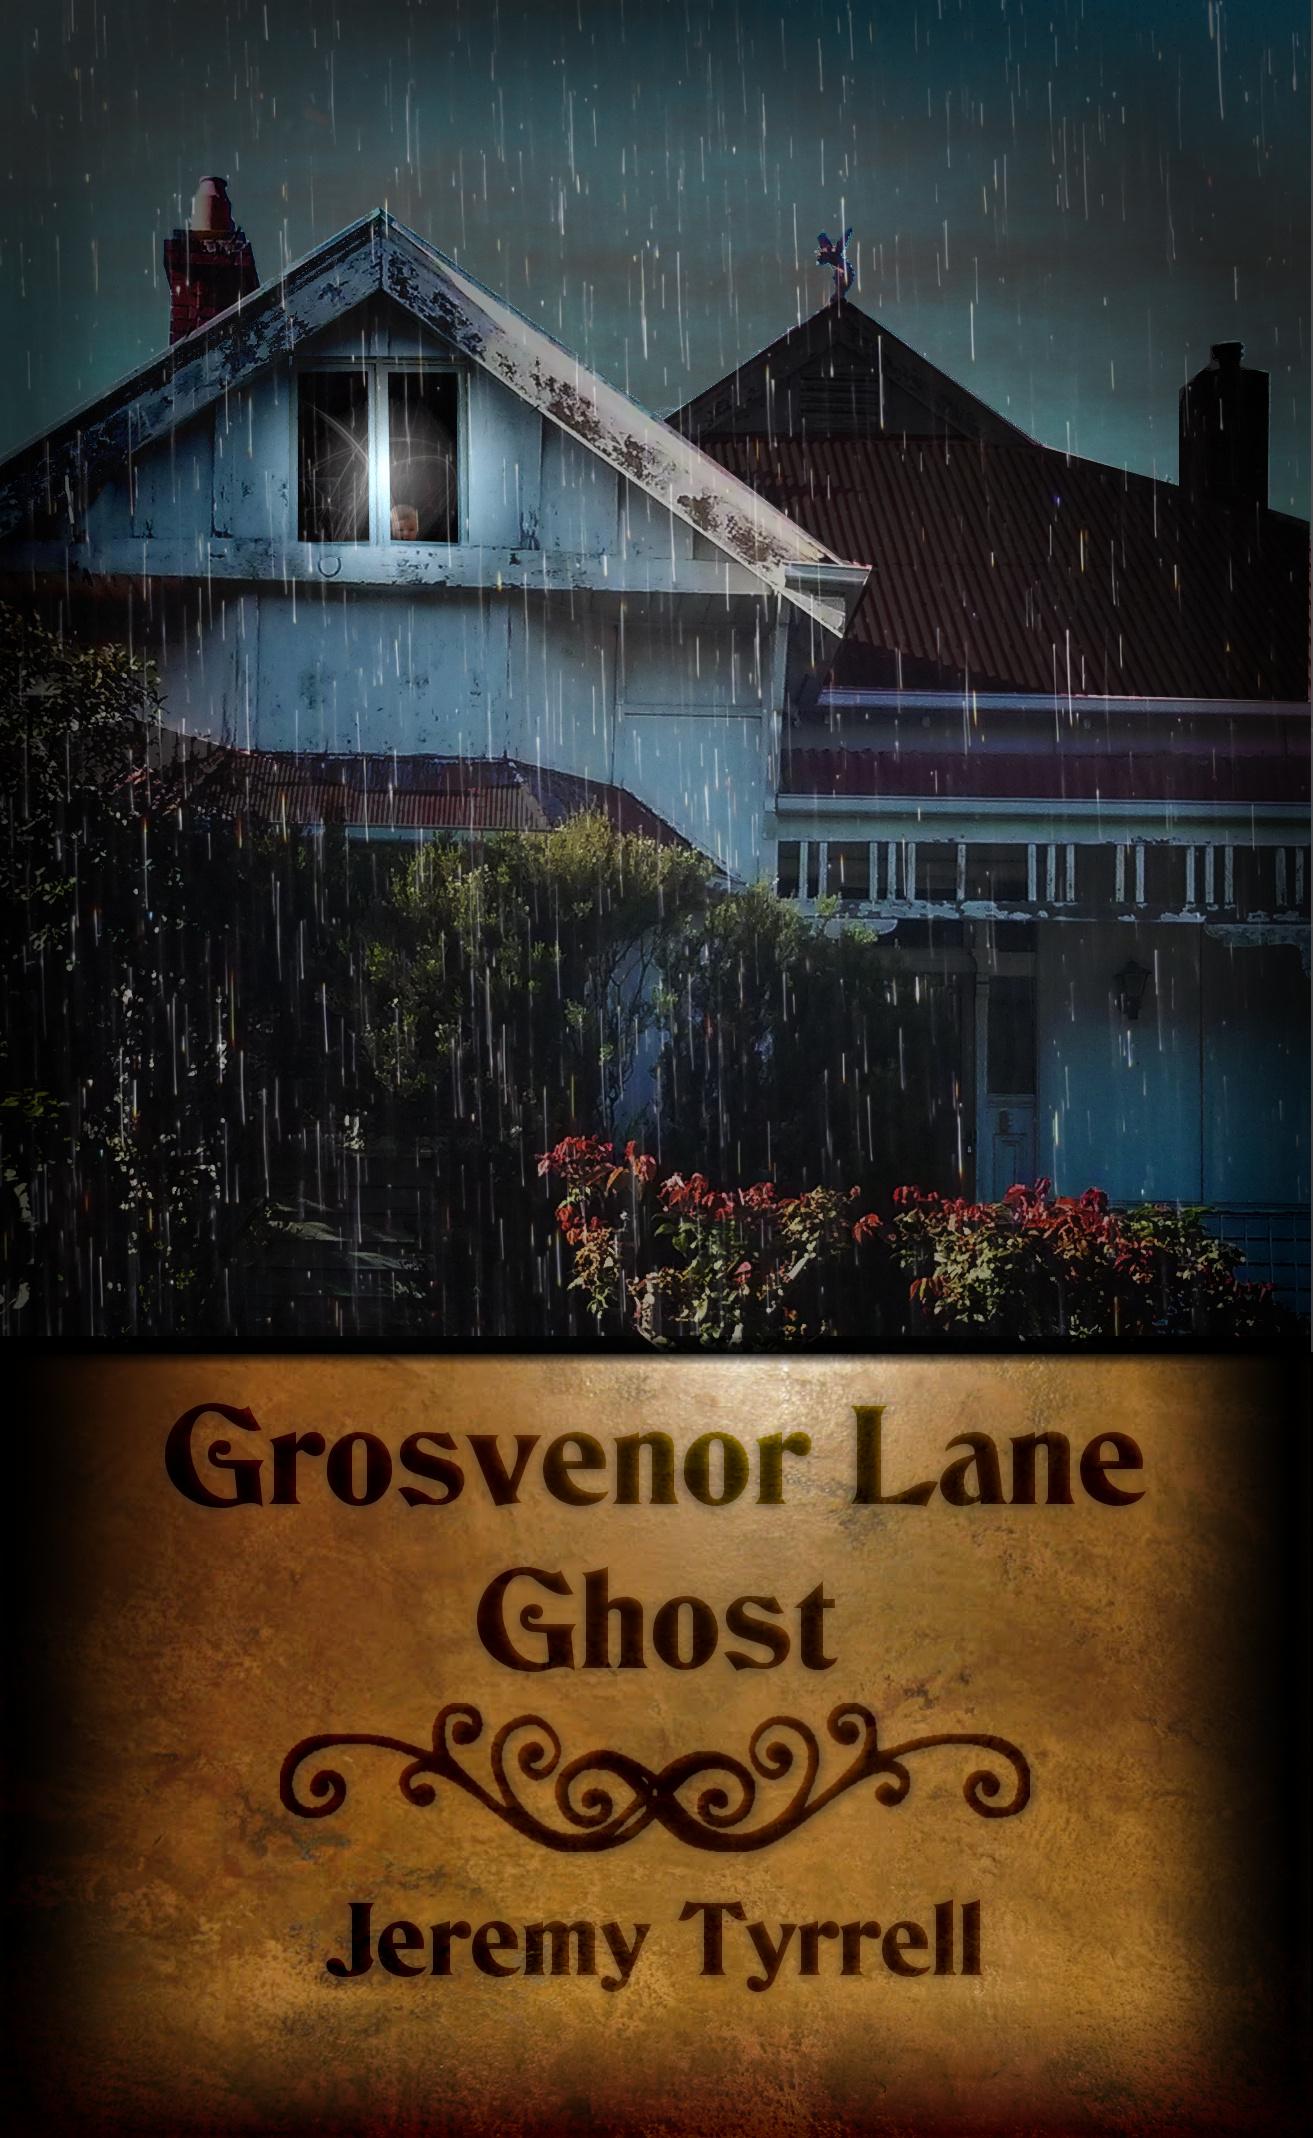 Grosvenor Lane Ghost is Free!